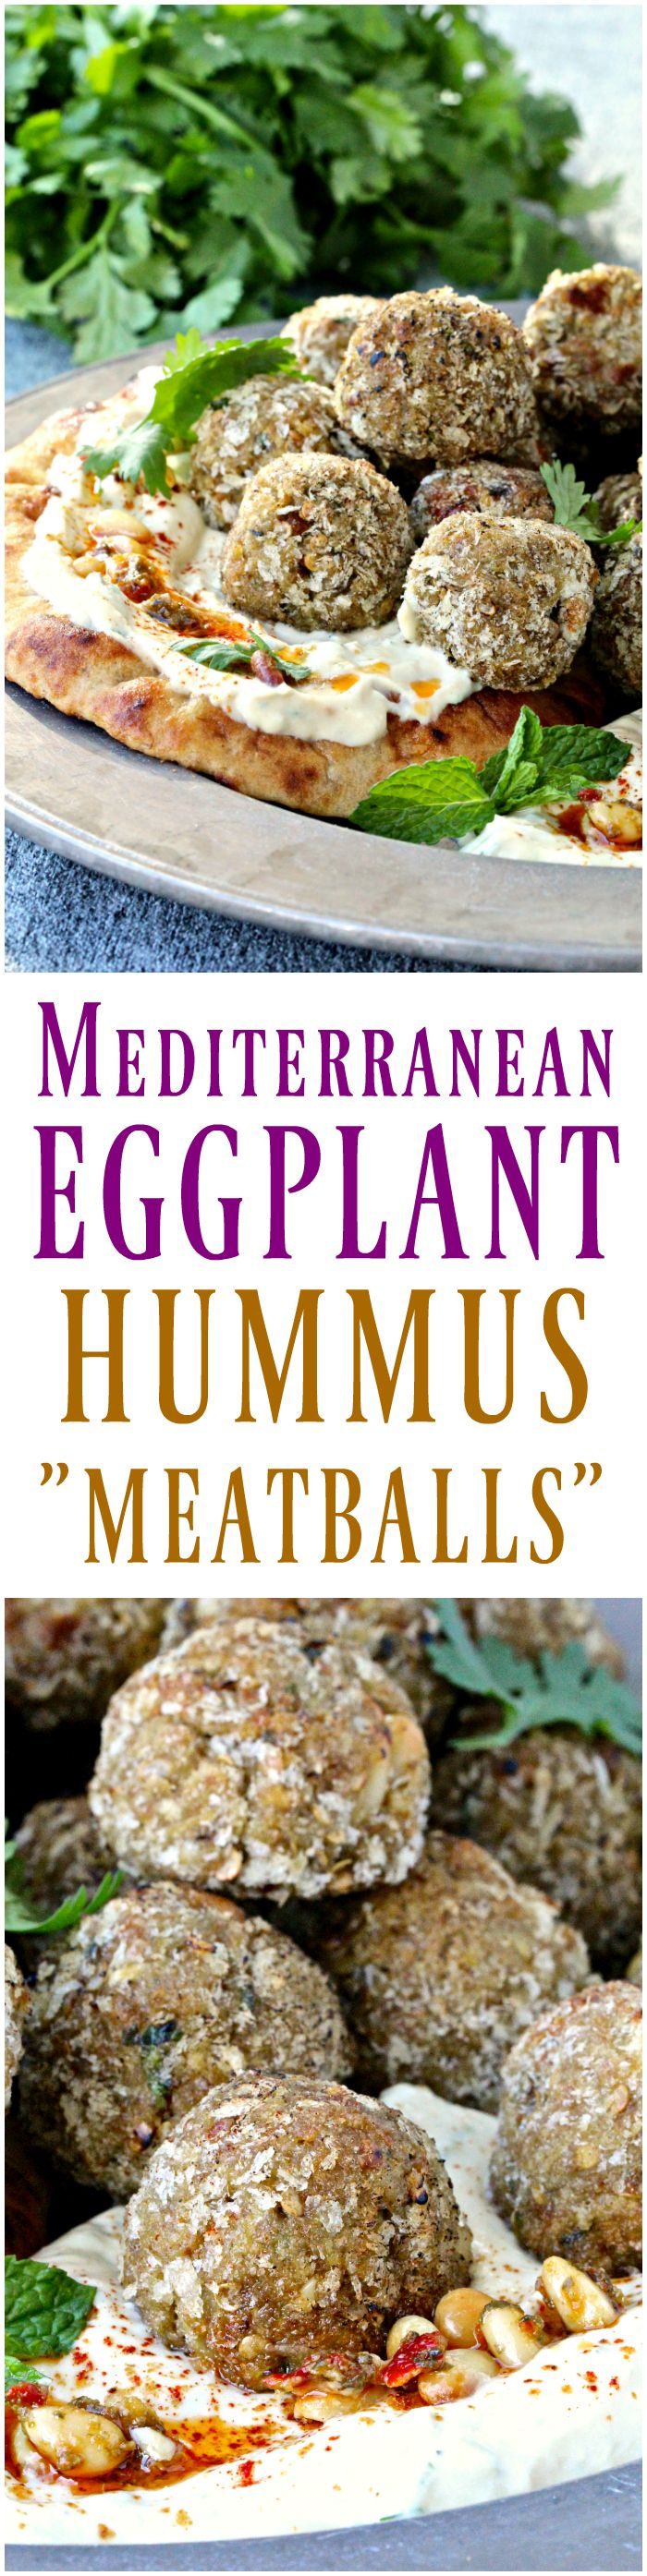 "#ad Mediterranean Eggplant Hummus ""Meatballs"" | @foodiephysician"